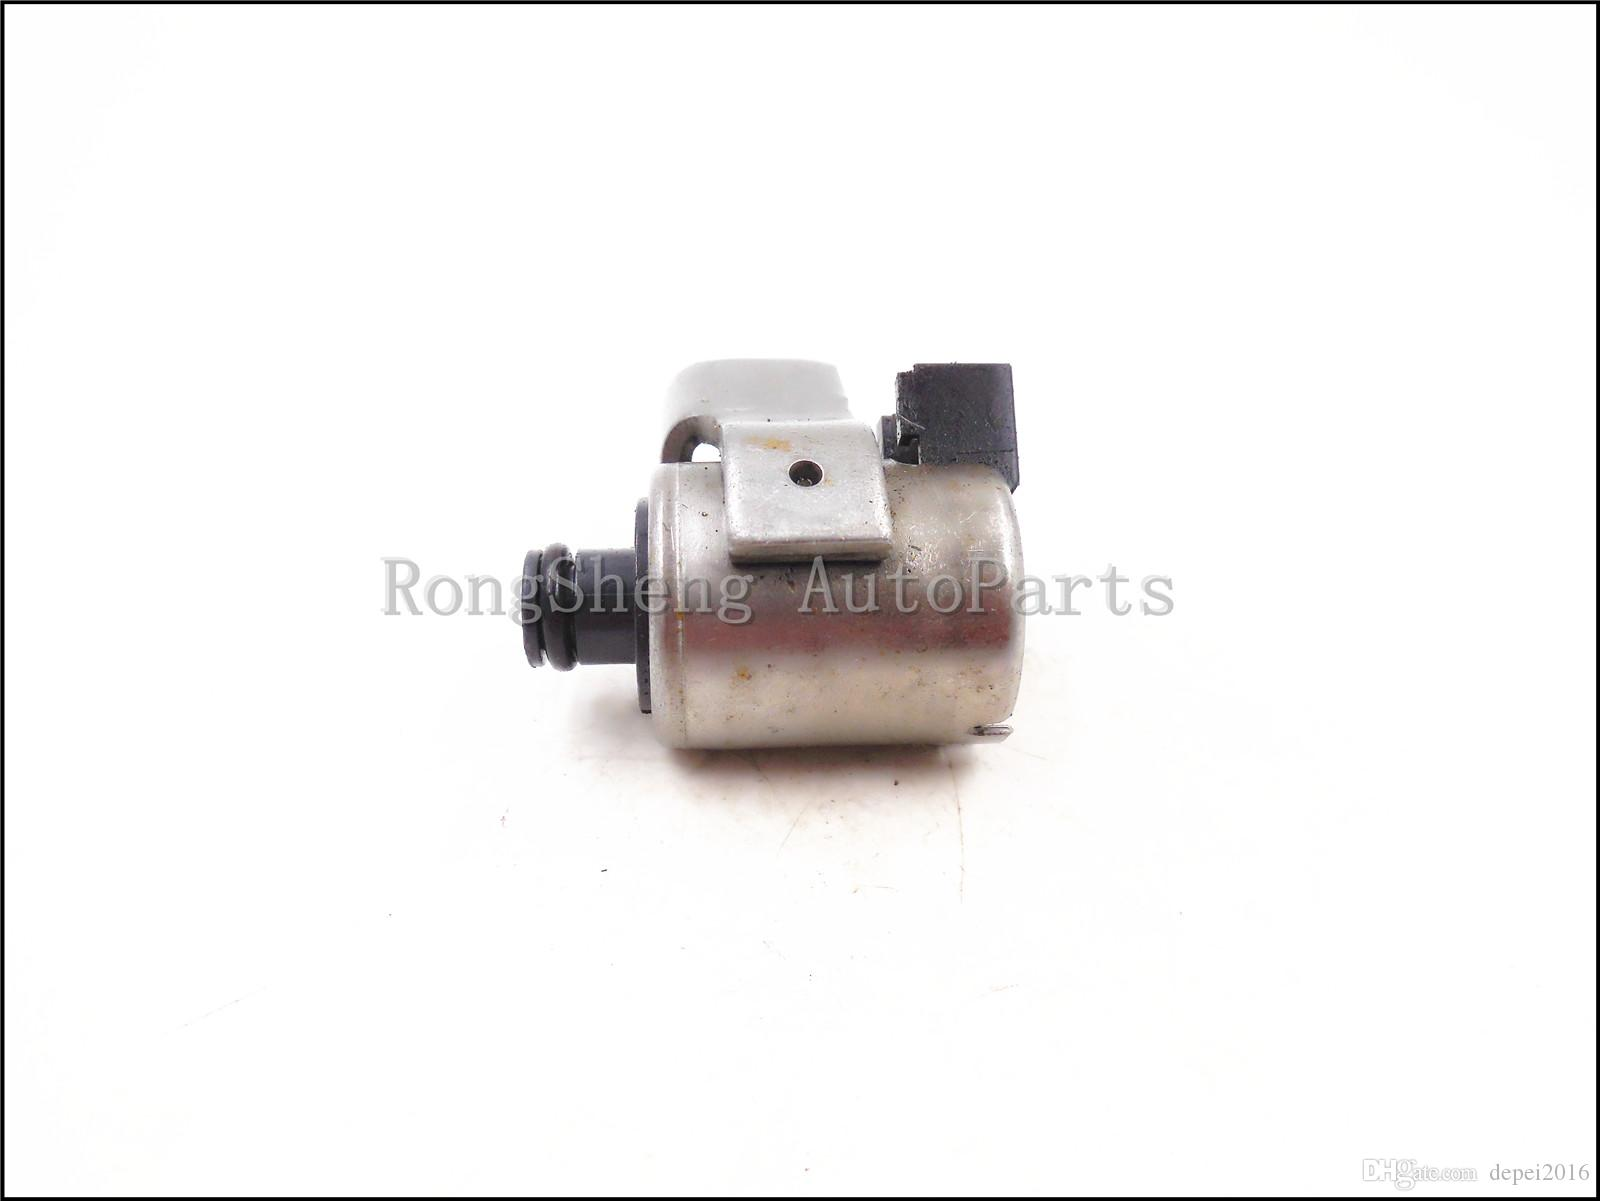 MITSUBISHI 변속기 용 솔레노이드 밸브 OEM G6T46278